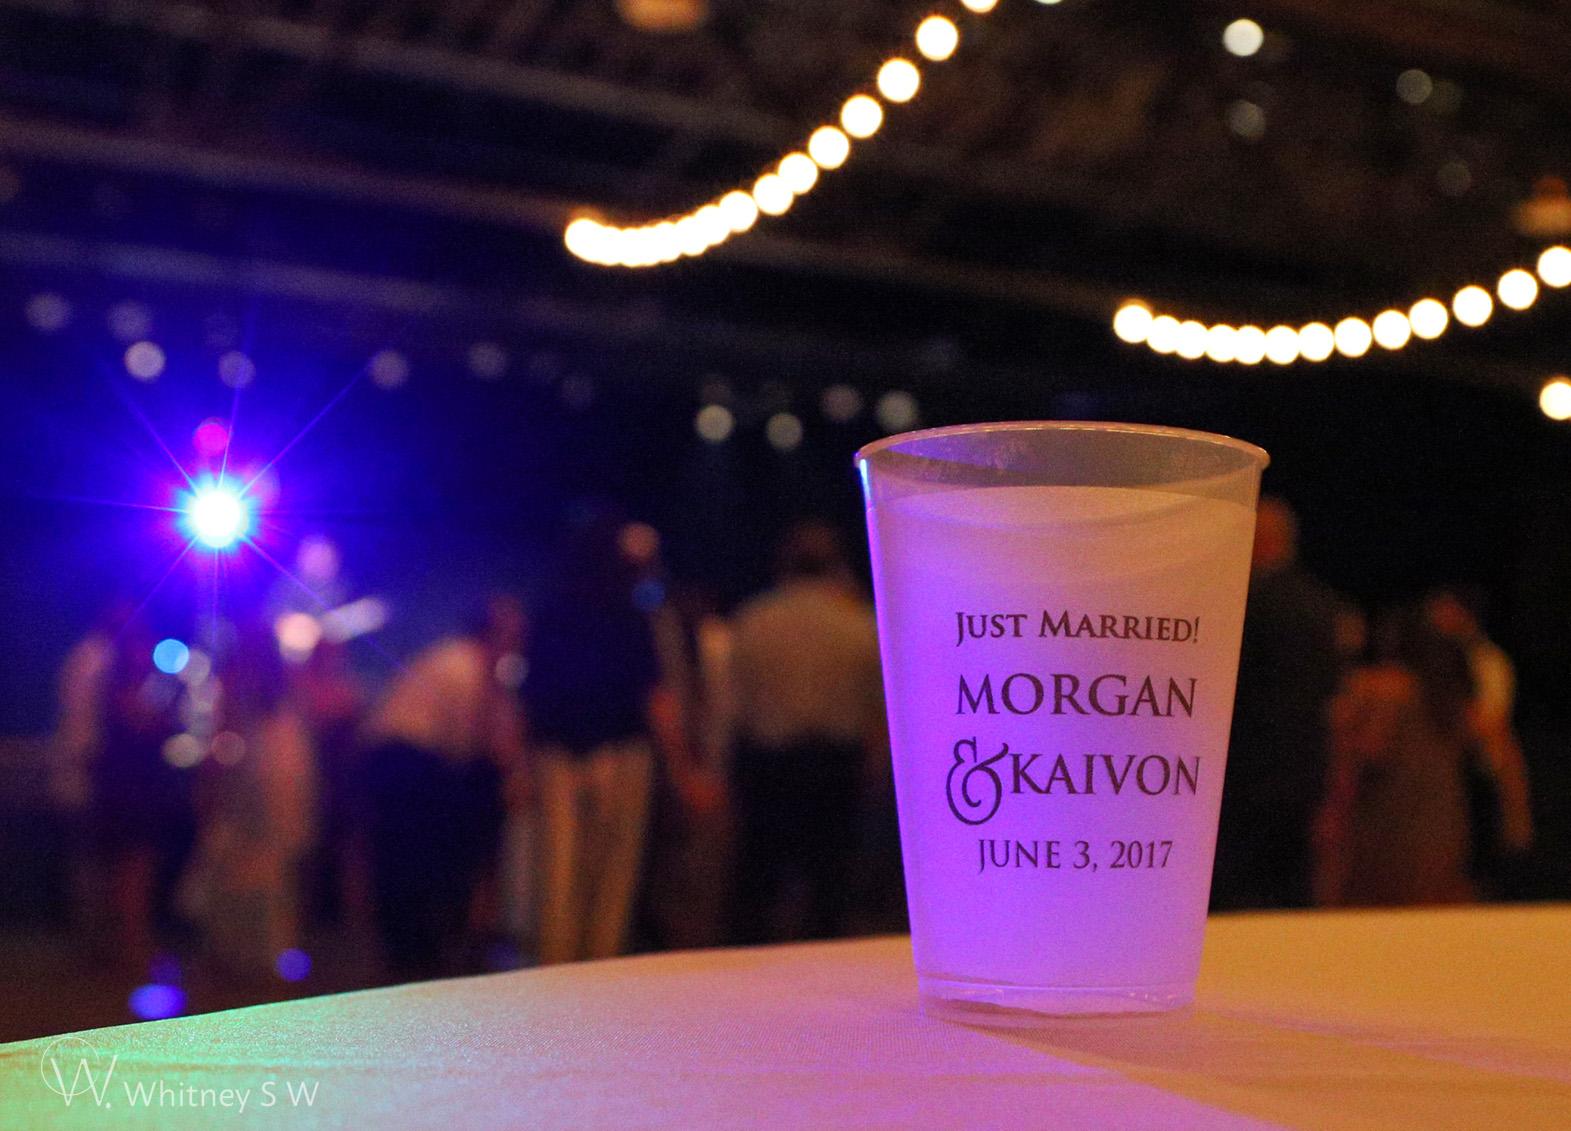 Morgan & Kaivon Wedding - Photography by Whitney S Williams whitneysw (51).jpg